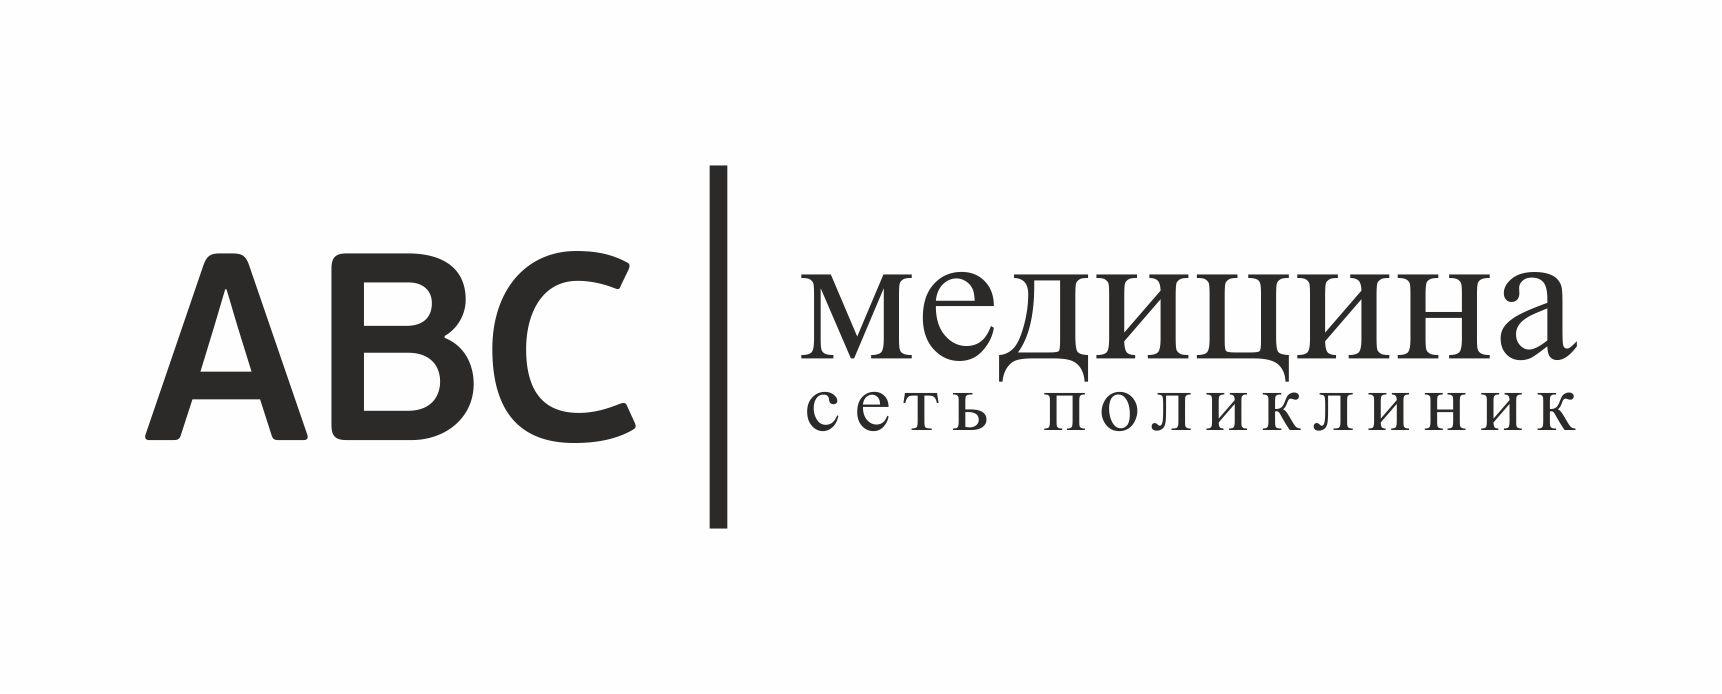 Клиника ABC на Розанова